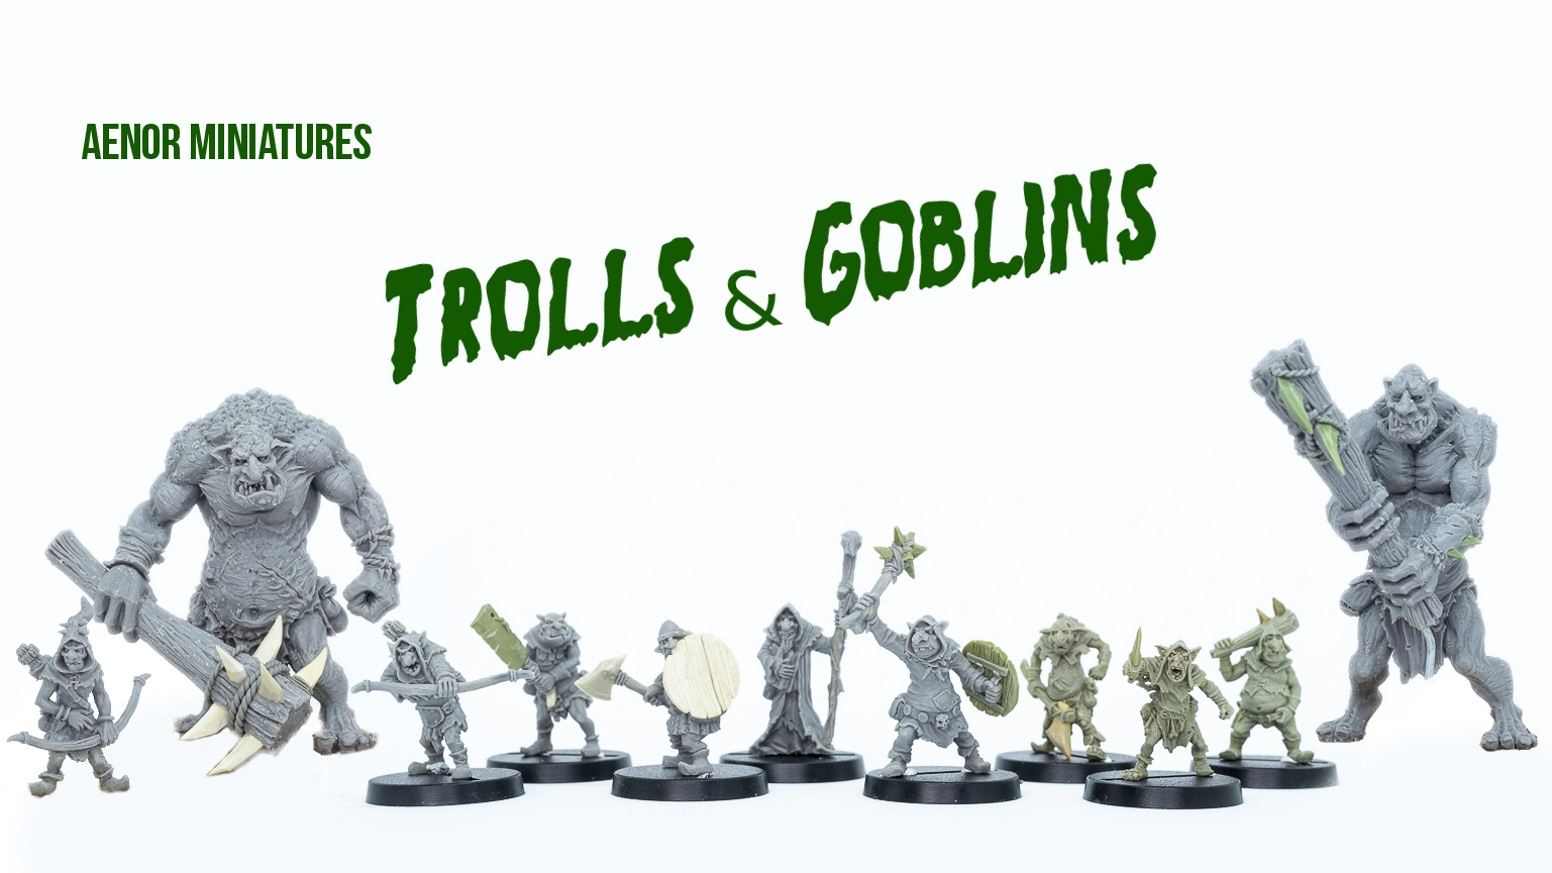 Trolls & Goblins by Sylvain Quirion @Aenor Miniatures — Kickstarter